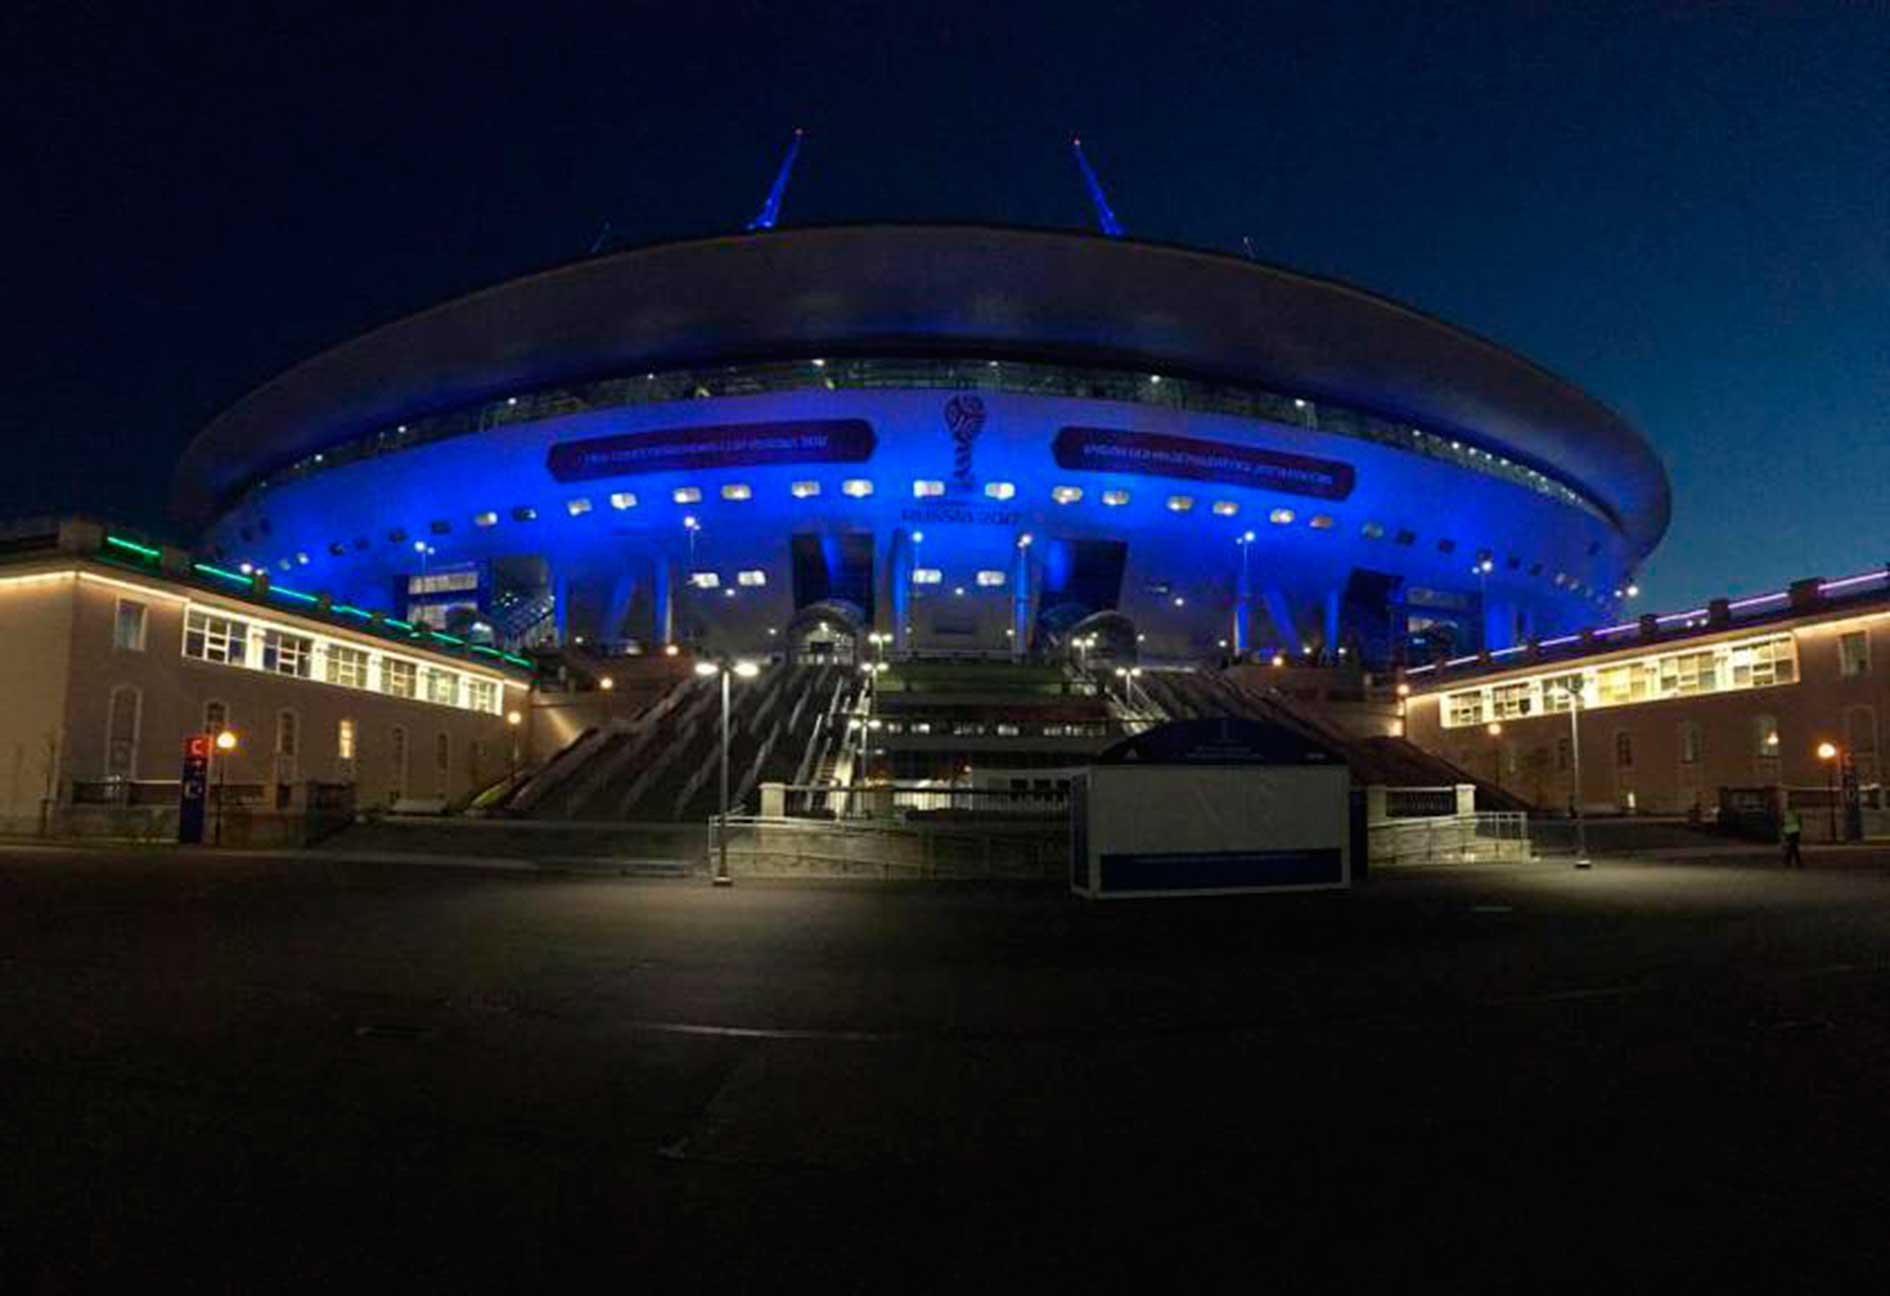 Estadio Zenit Arena de Noche